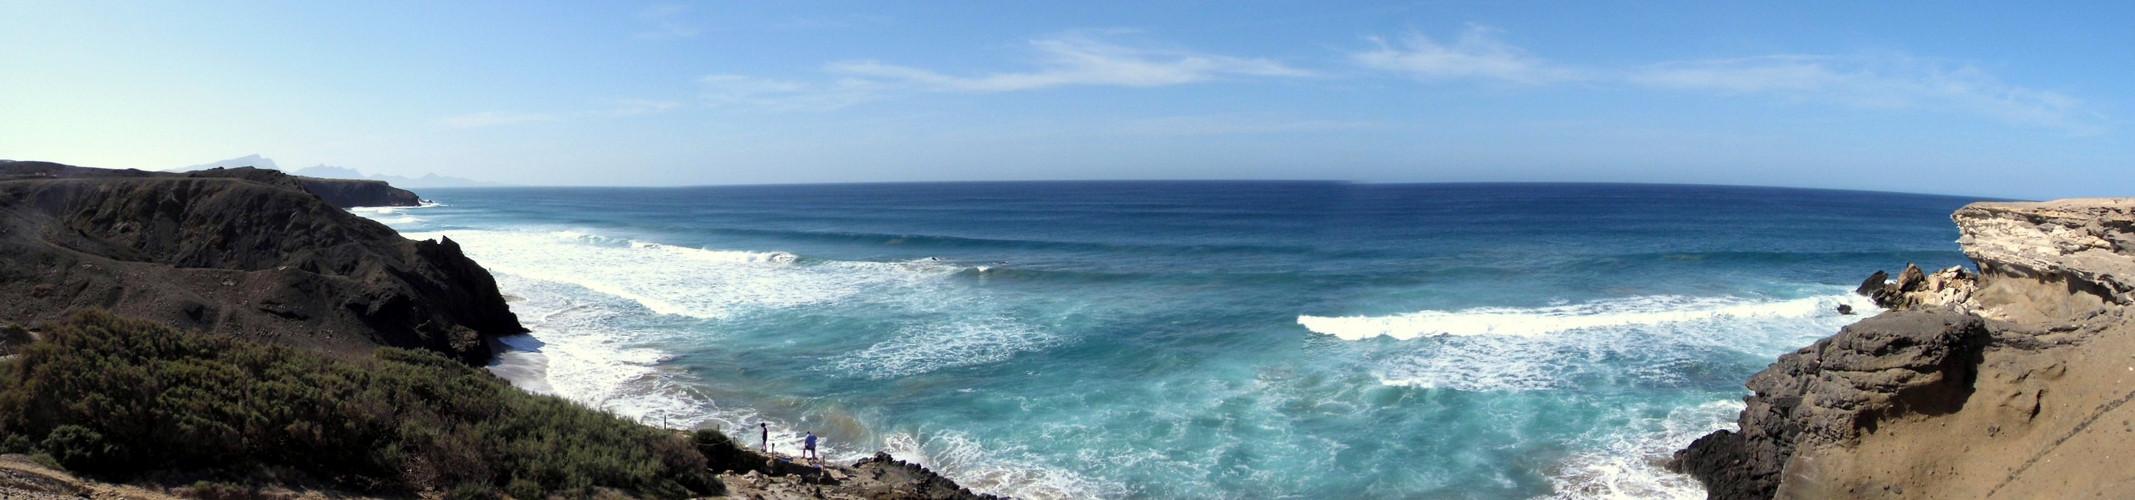 Fuerteventura-Panorama